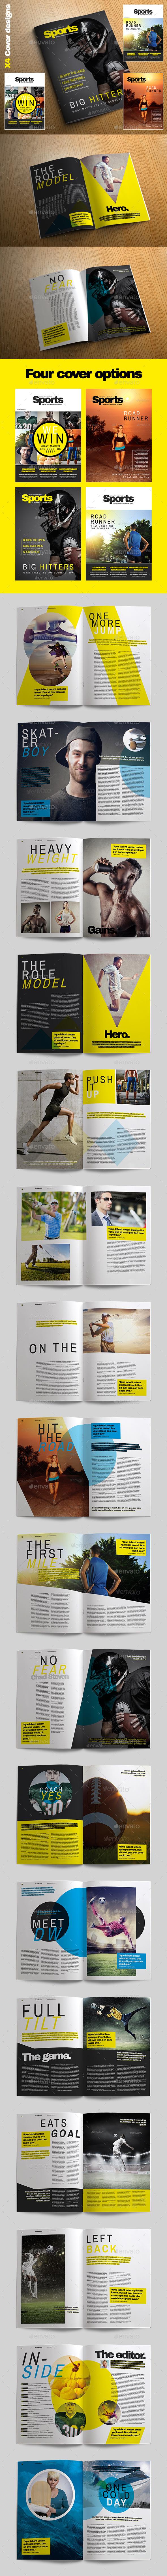 Sports Magazine - Magazines Print Templates